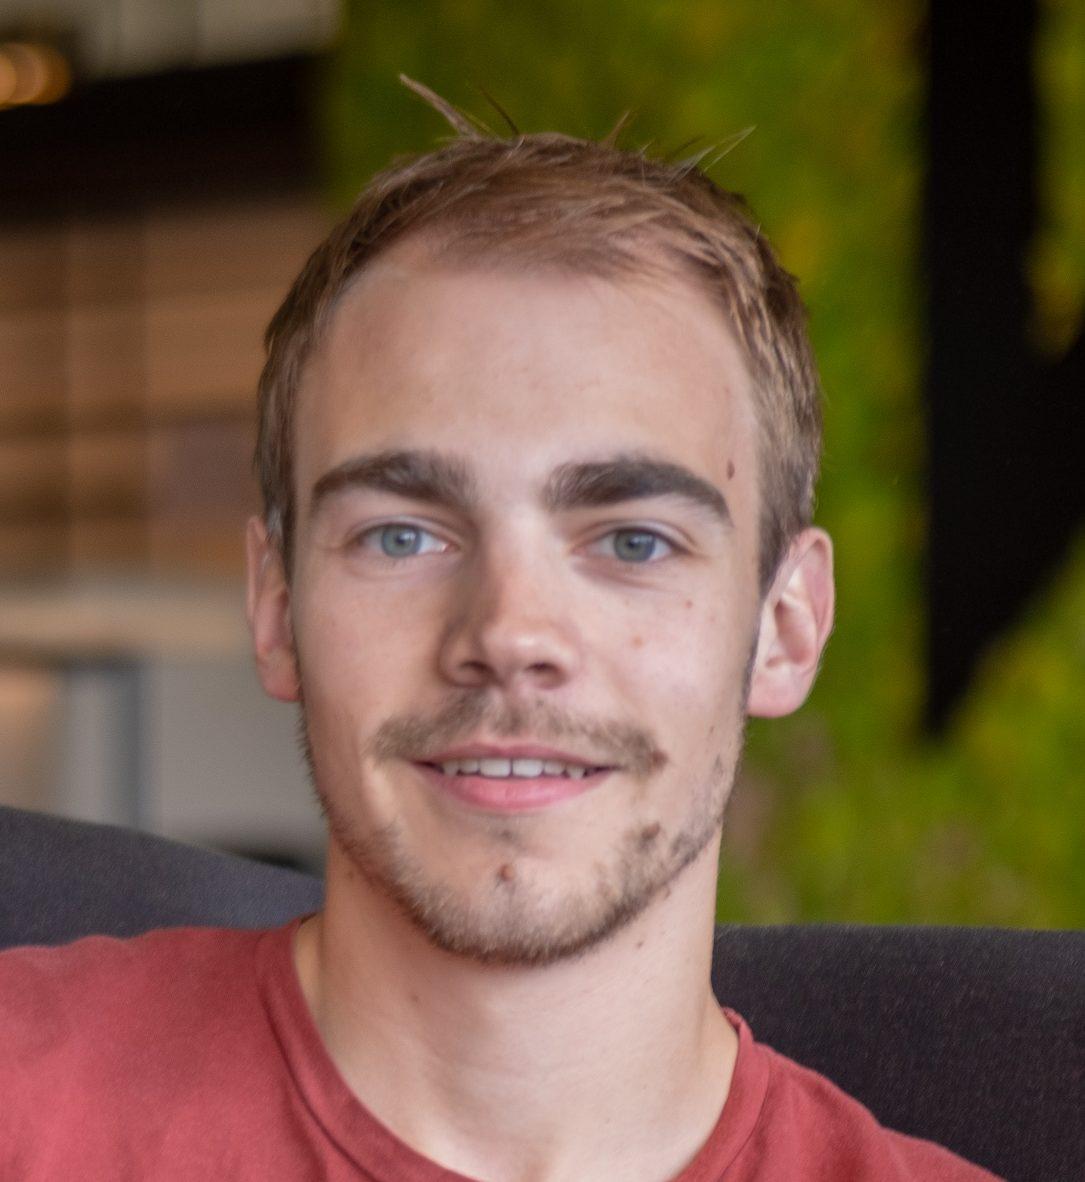 Sander Crevits